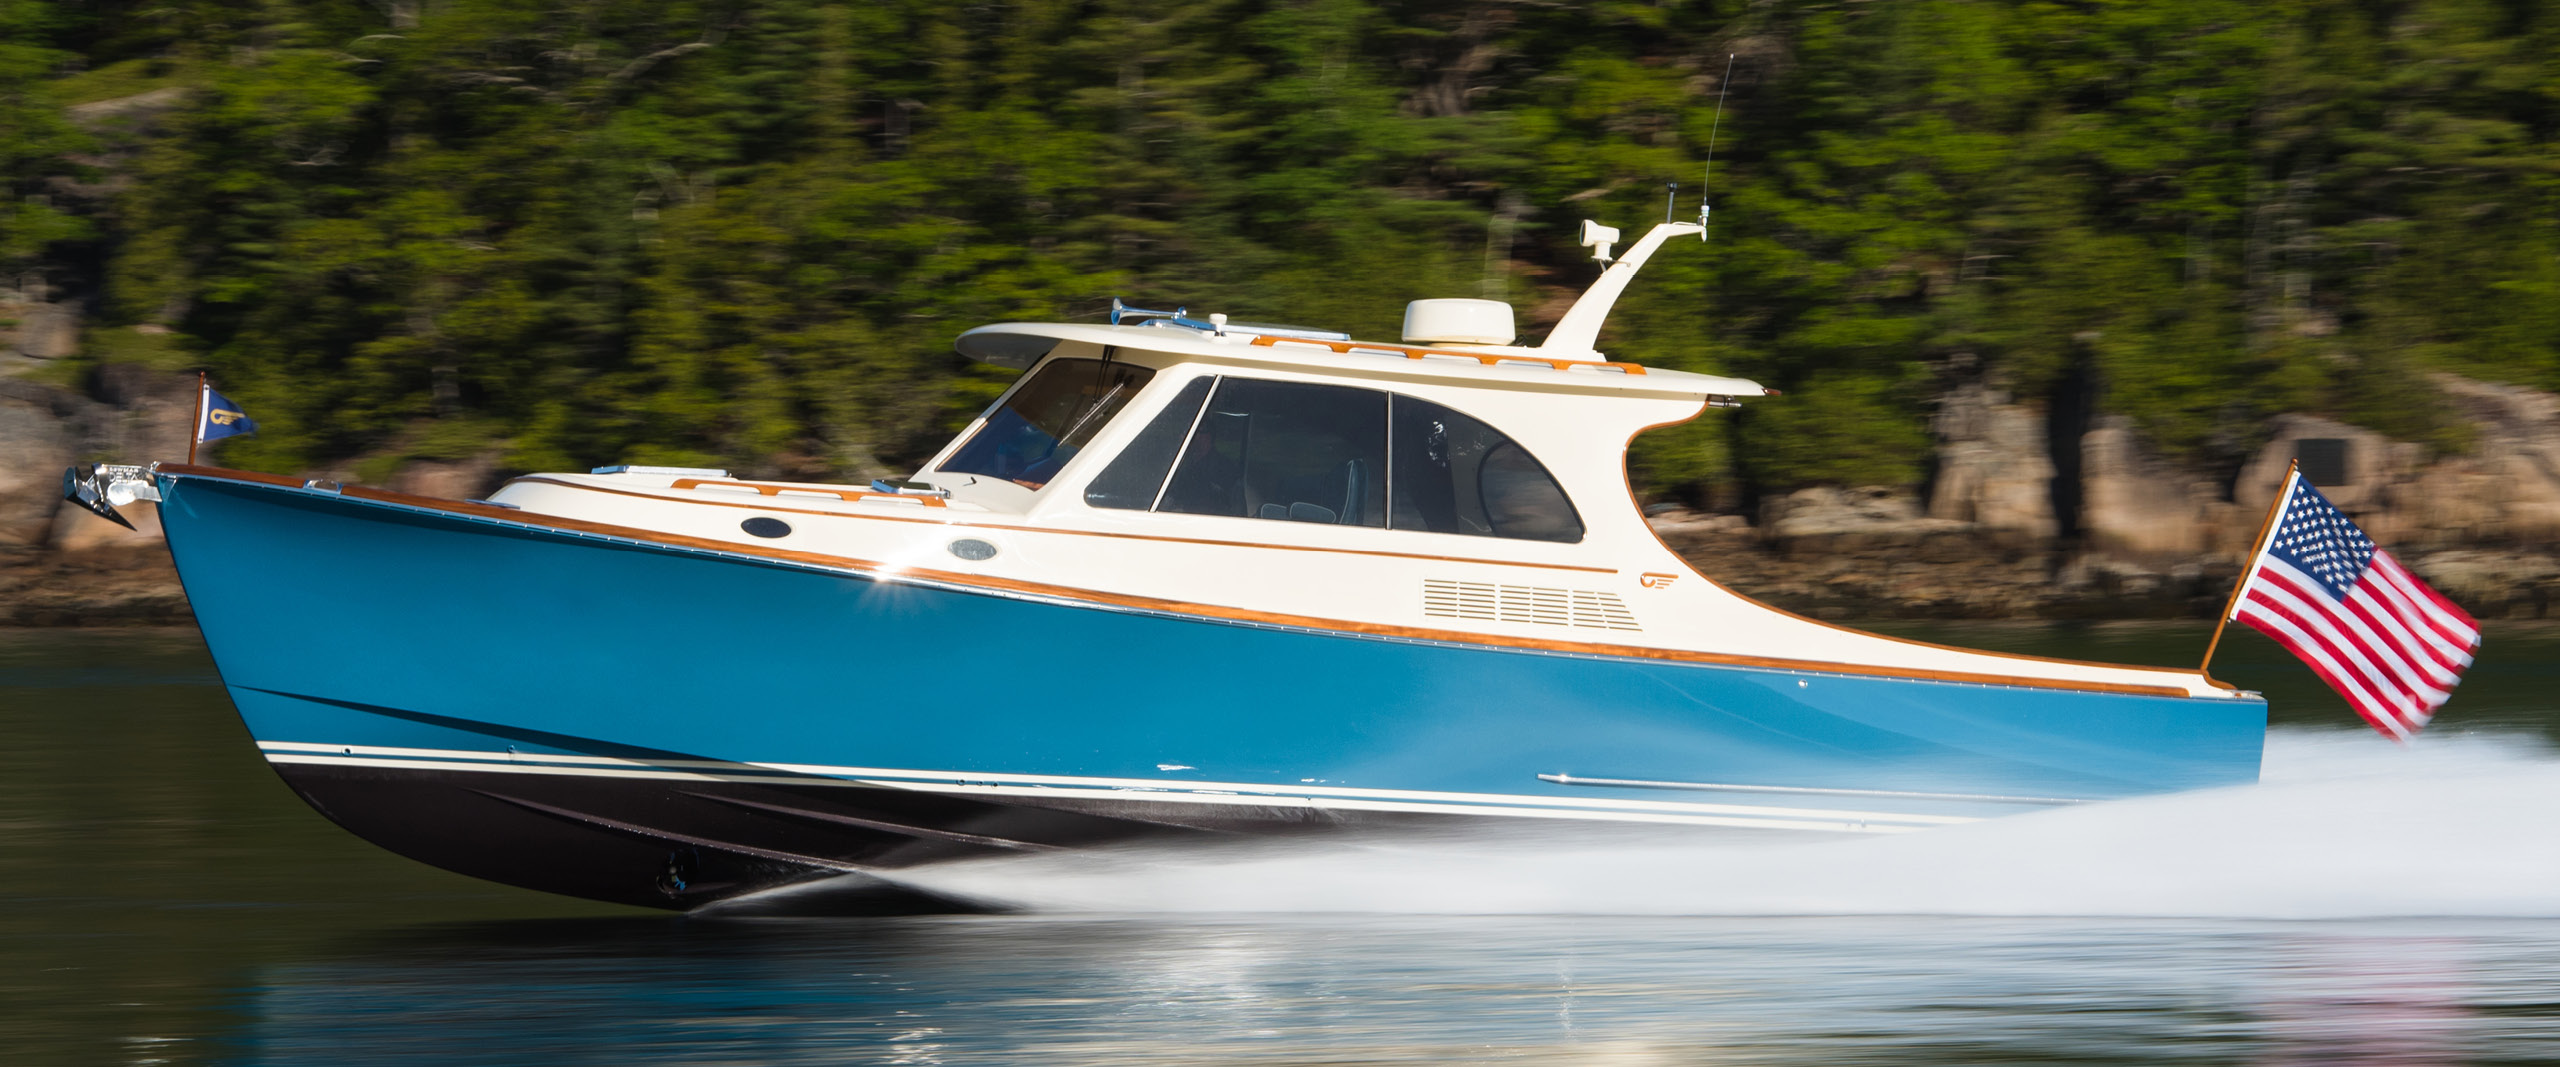 Hinckley Introduces the Innovative Picnic Boat 40 | Hinckley